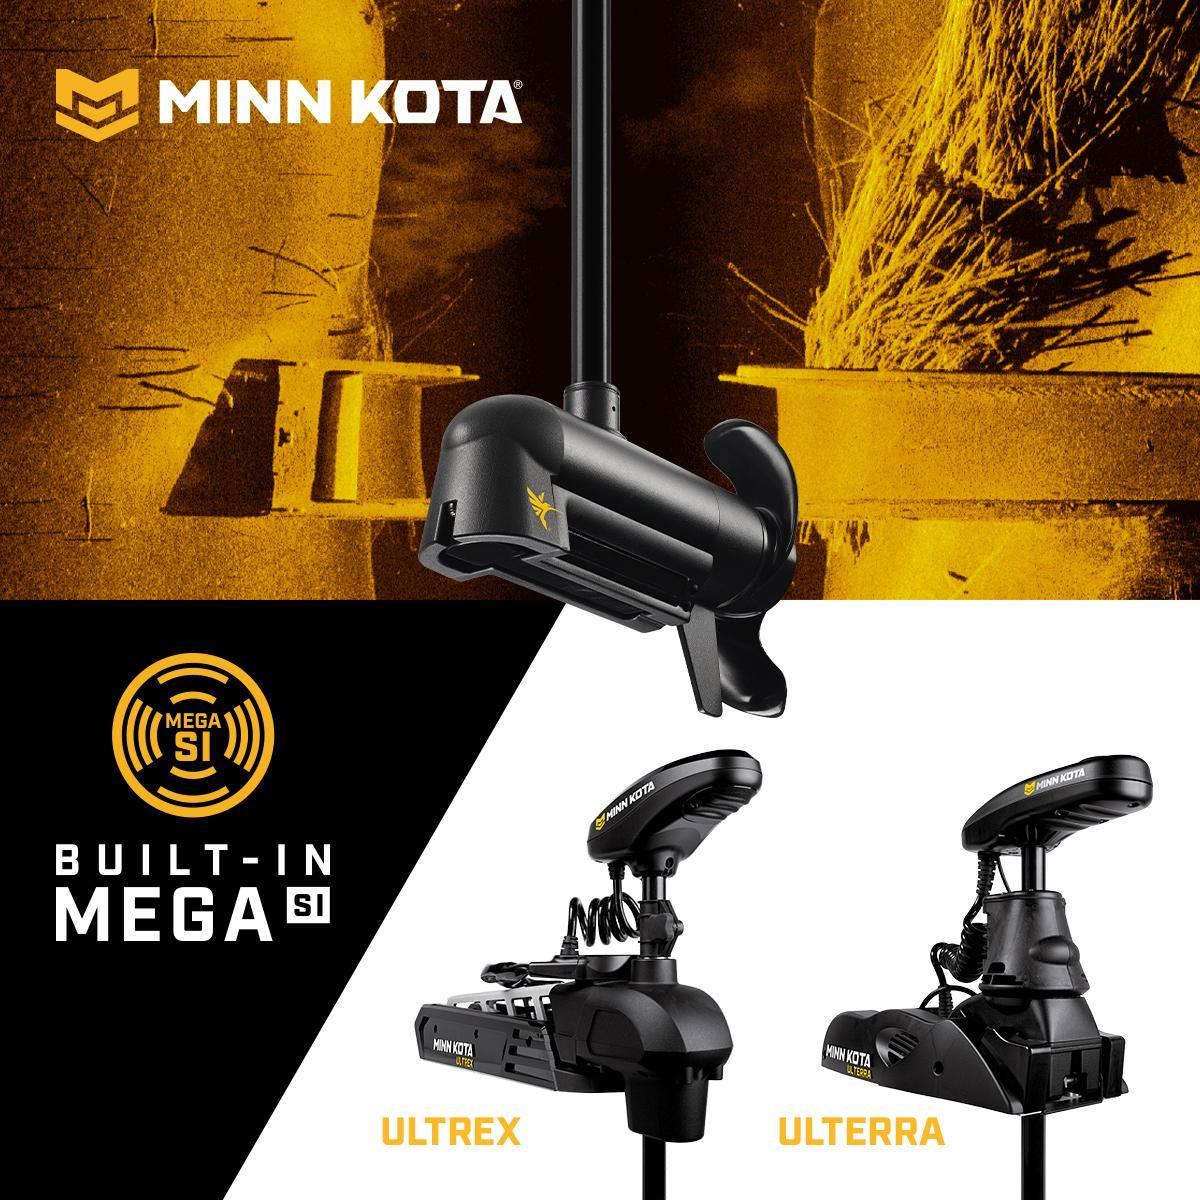 Minn Kota Bugmotoren mit integriertem MEGA Side Imaging von Humminbird